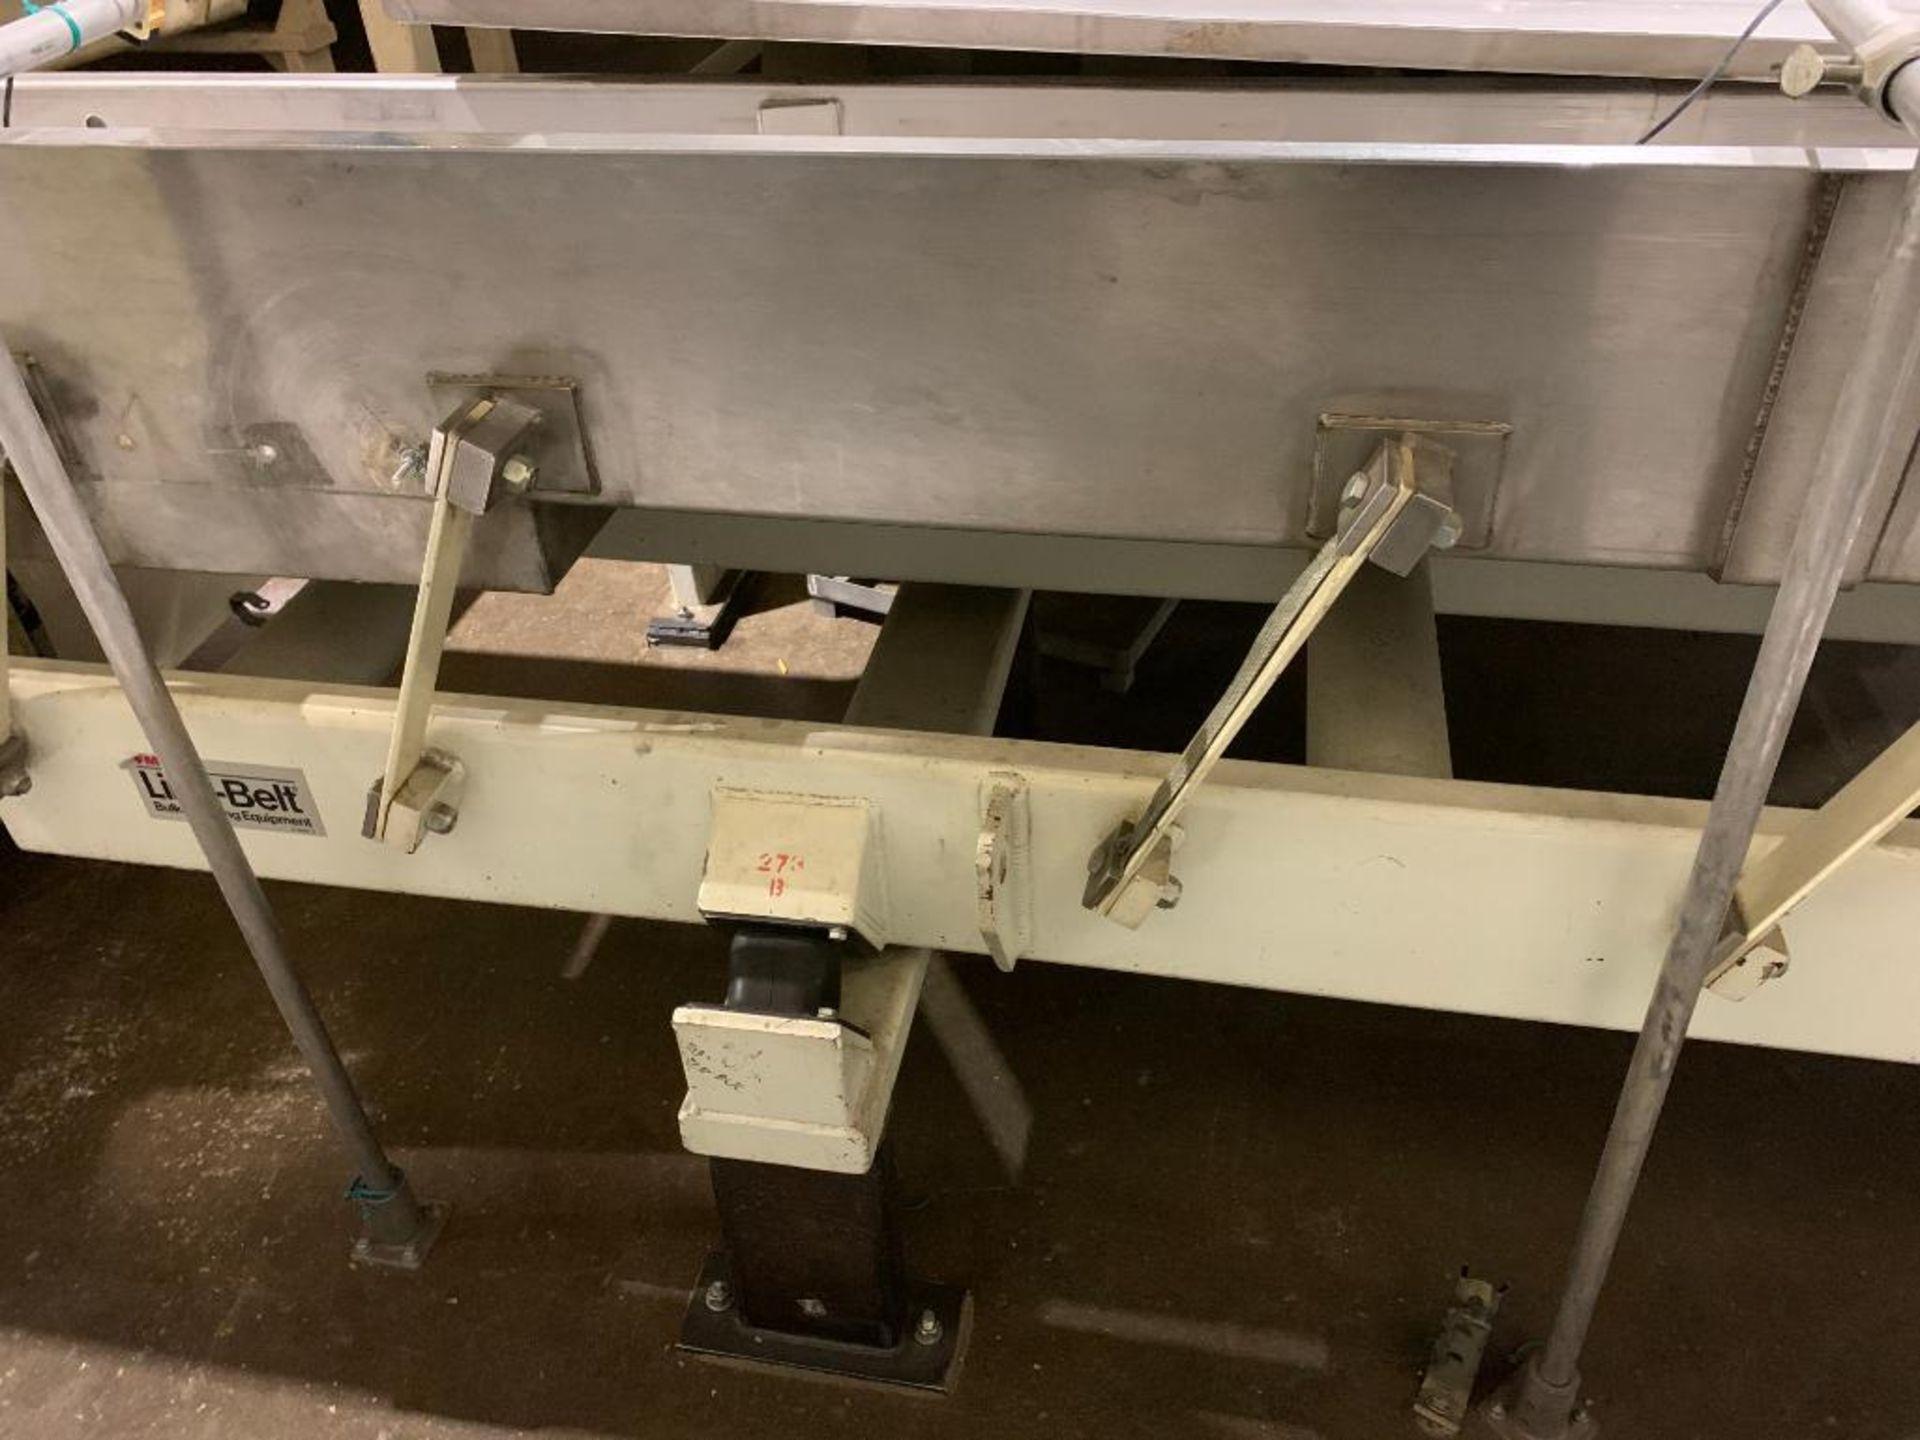 1992 Link-Belt vibratory conveyor, model LBL2405-10X12-10 - Image 6 of 34